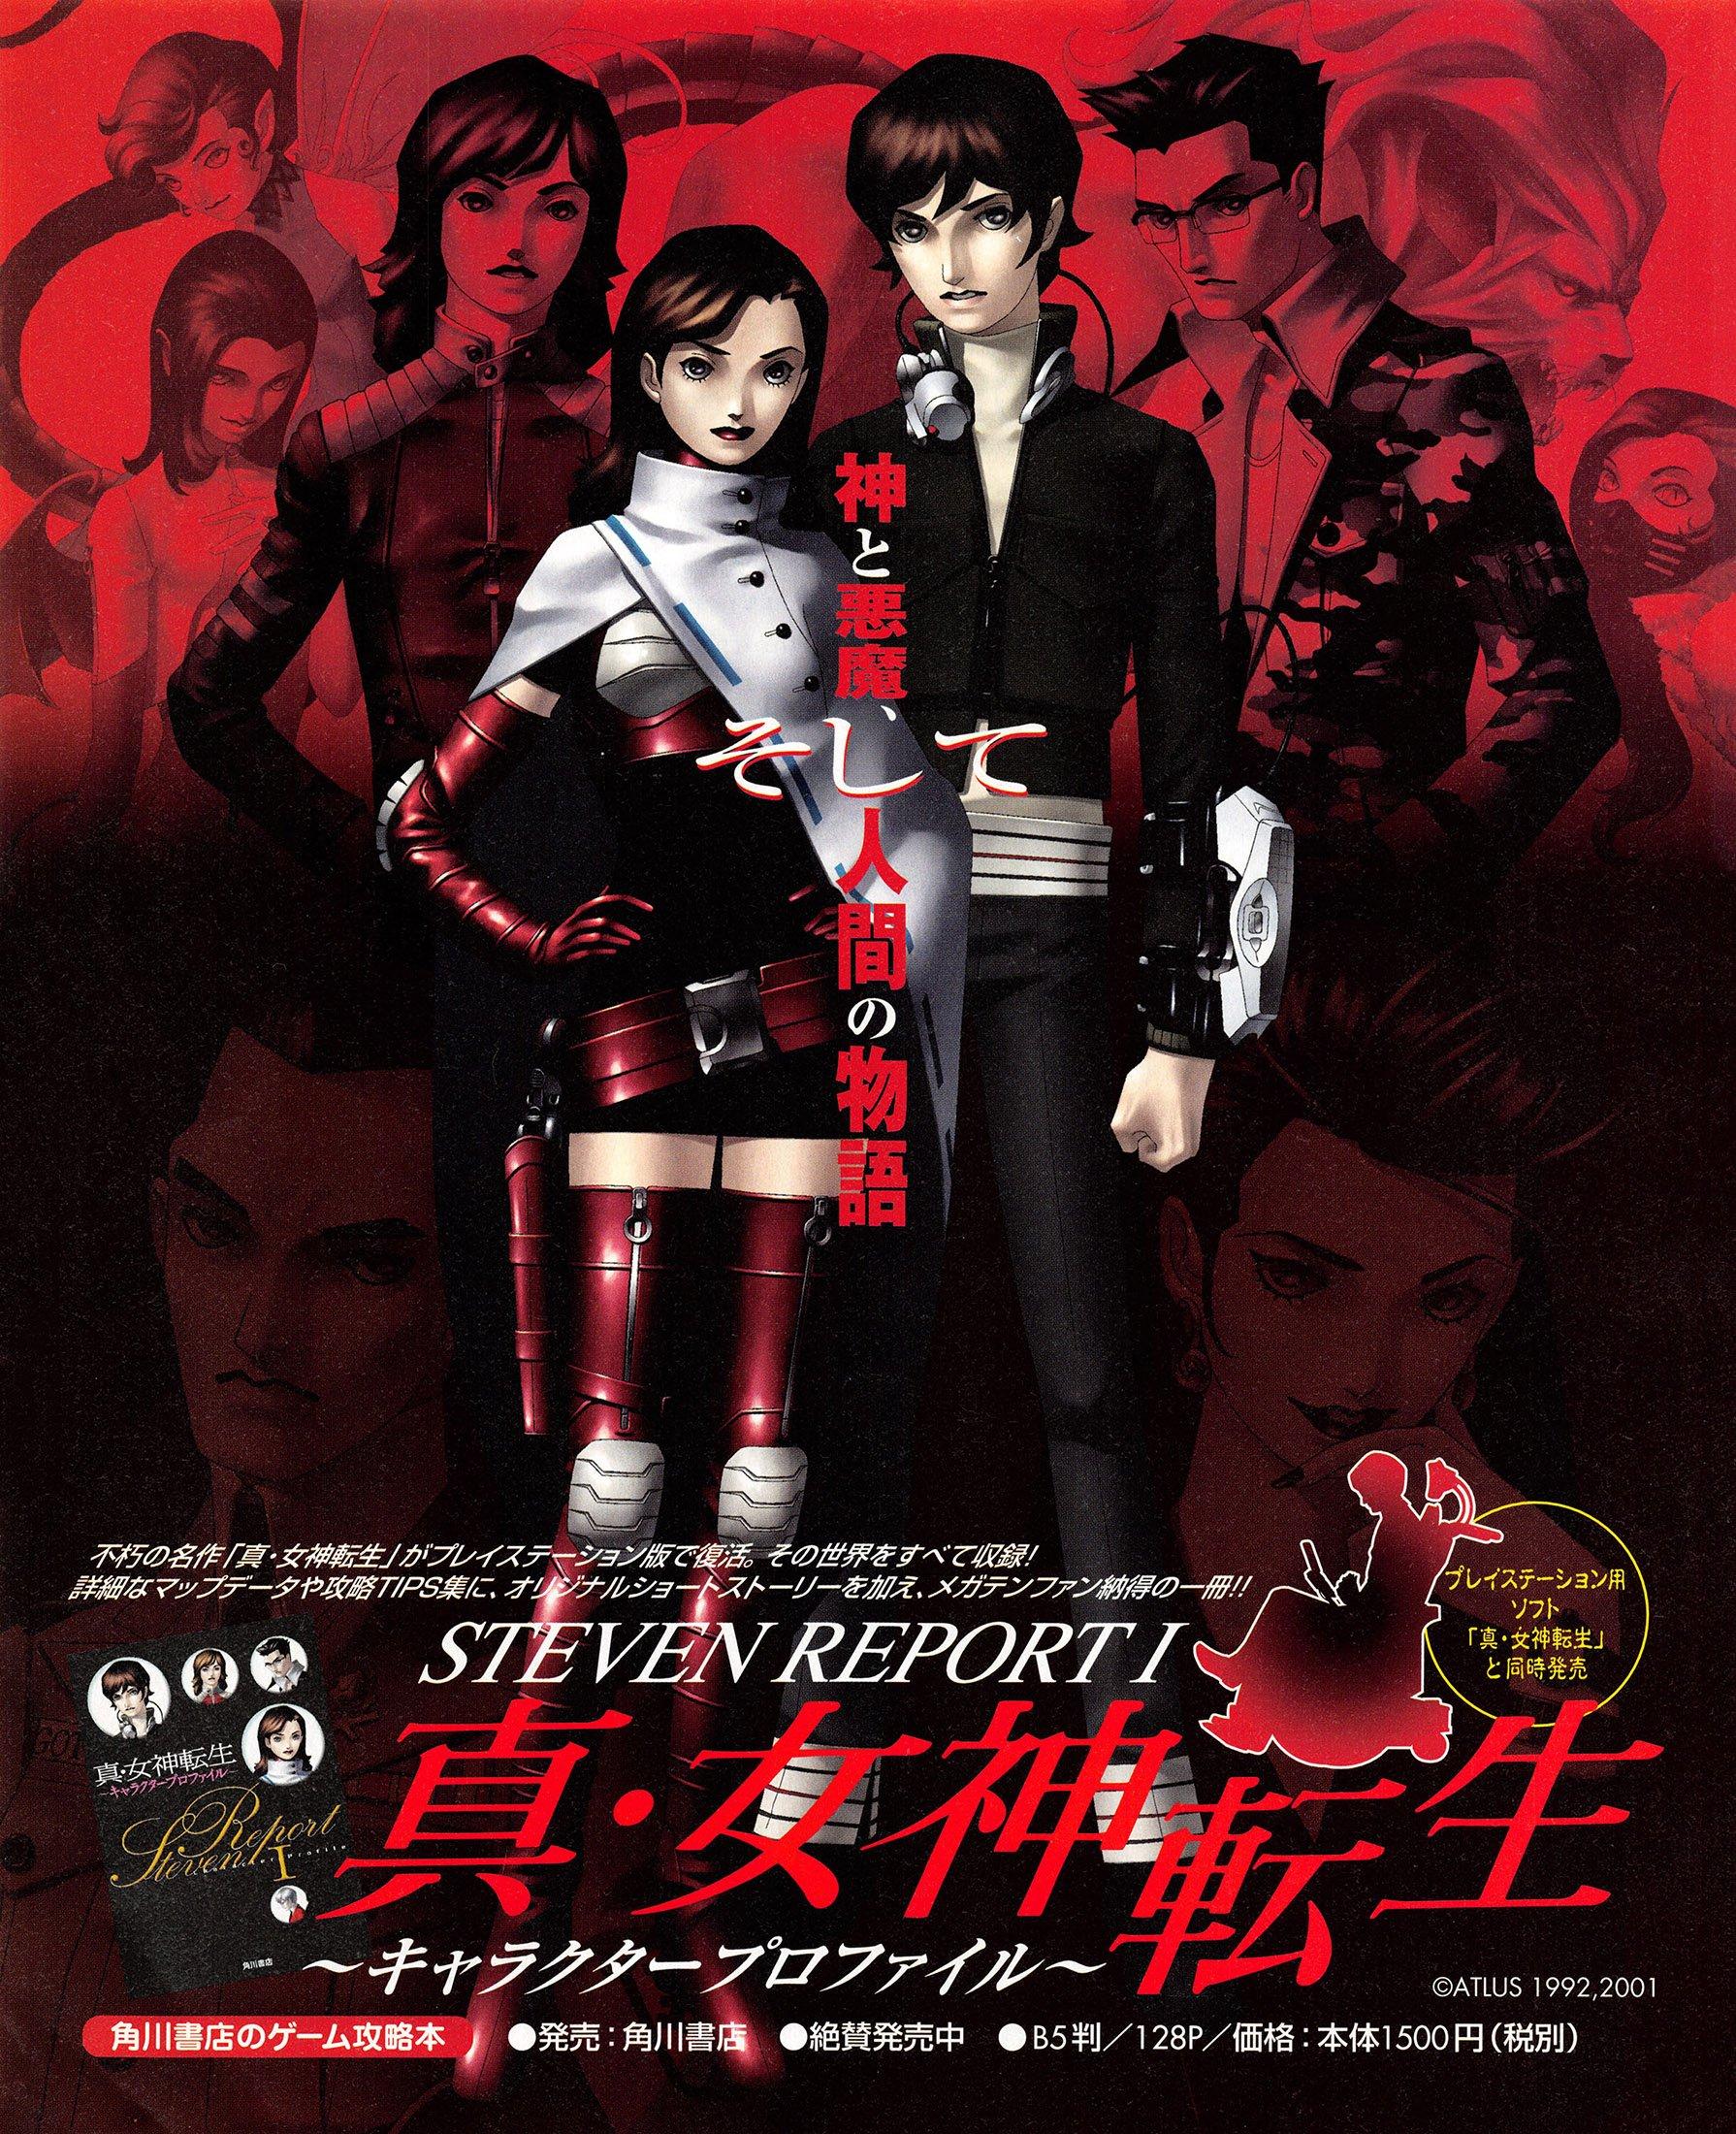 Shin Megami Tensei - Character Profile: Steven Report I